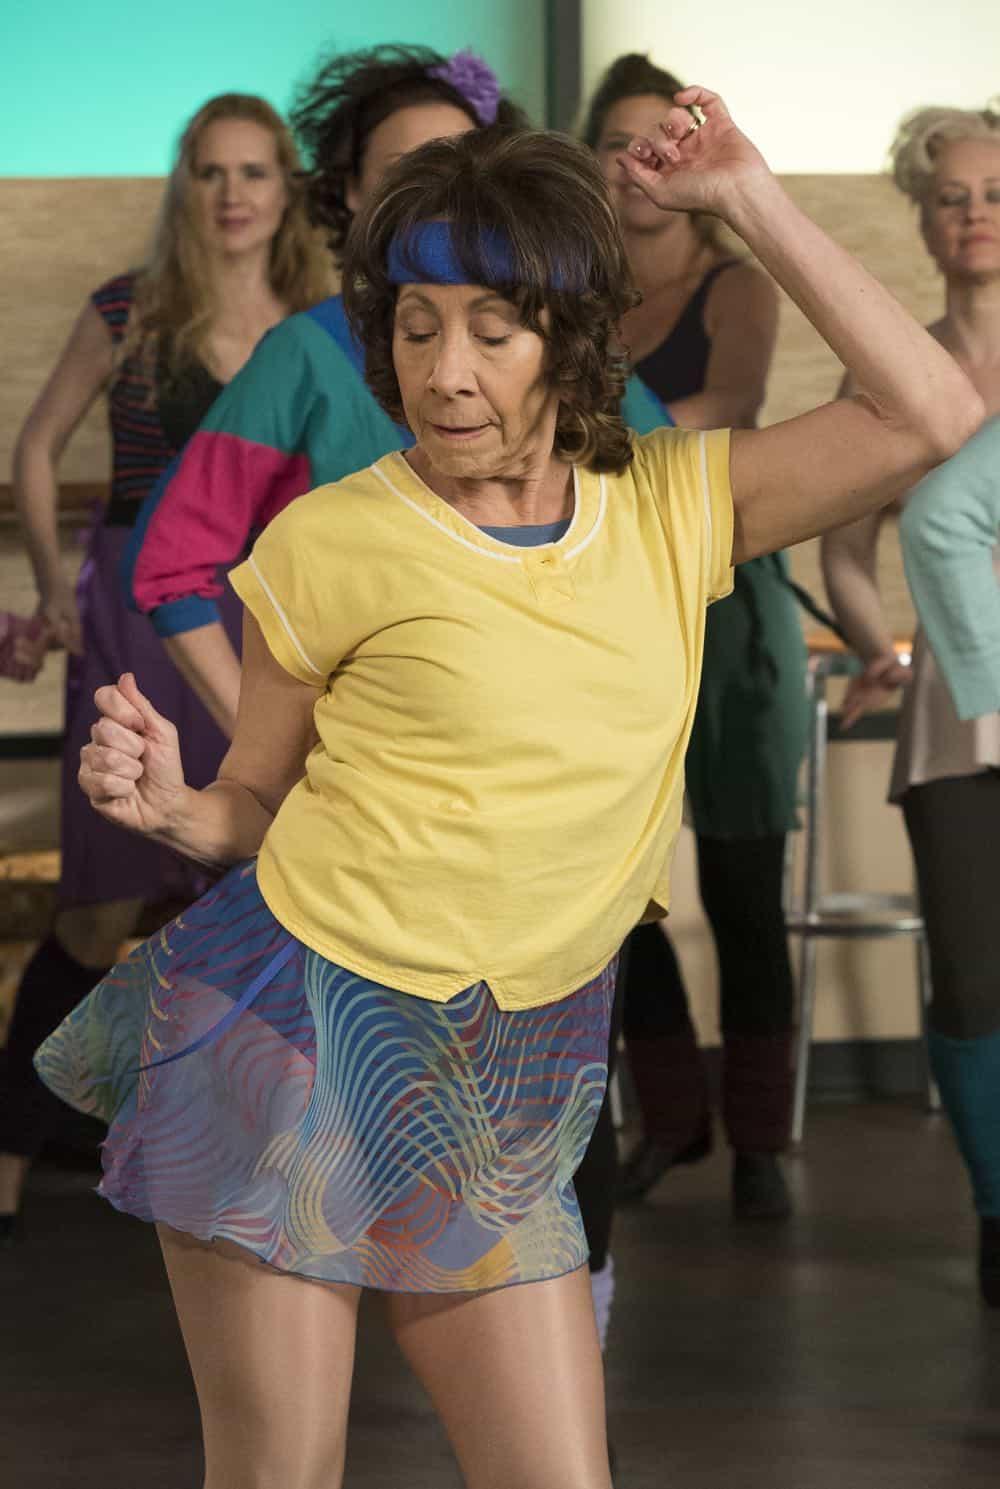 The Goldbergs Episode 19 Season 5 Flashy Little Flashdancer 15